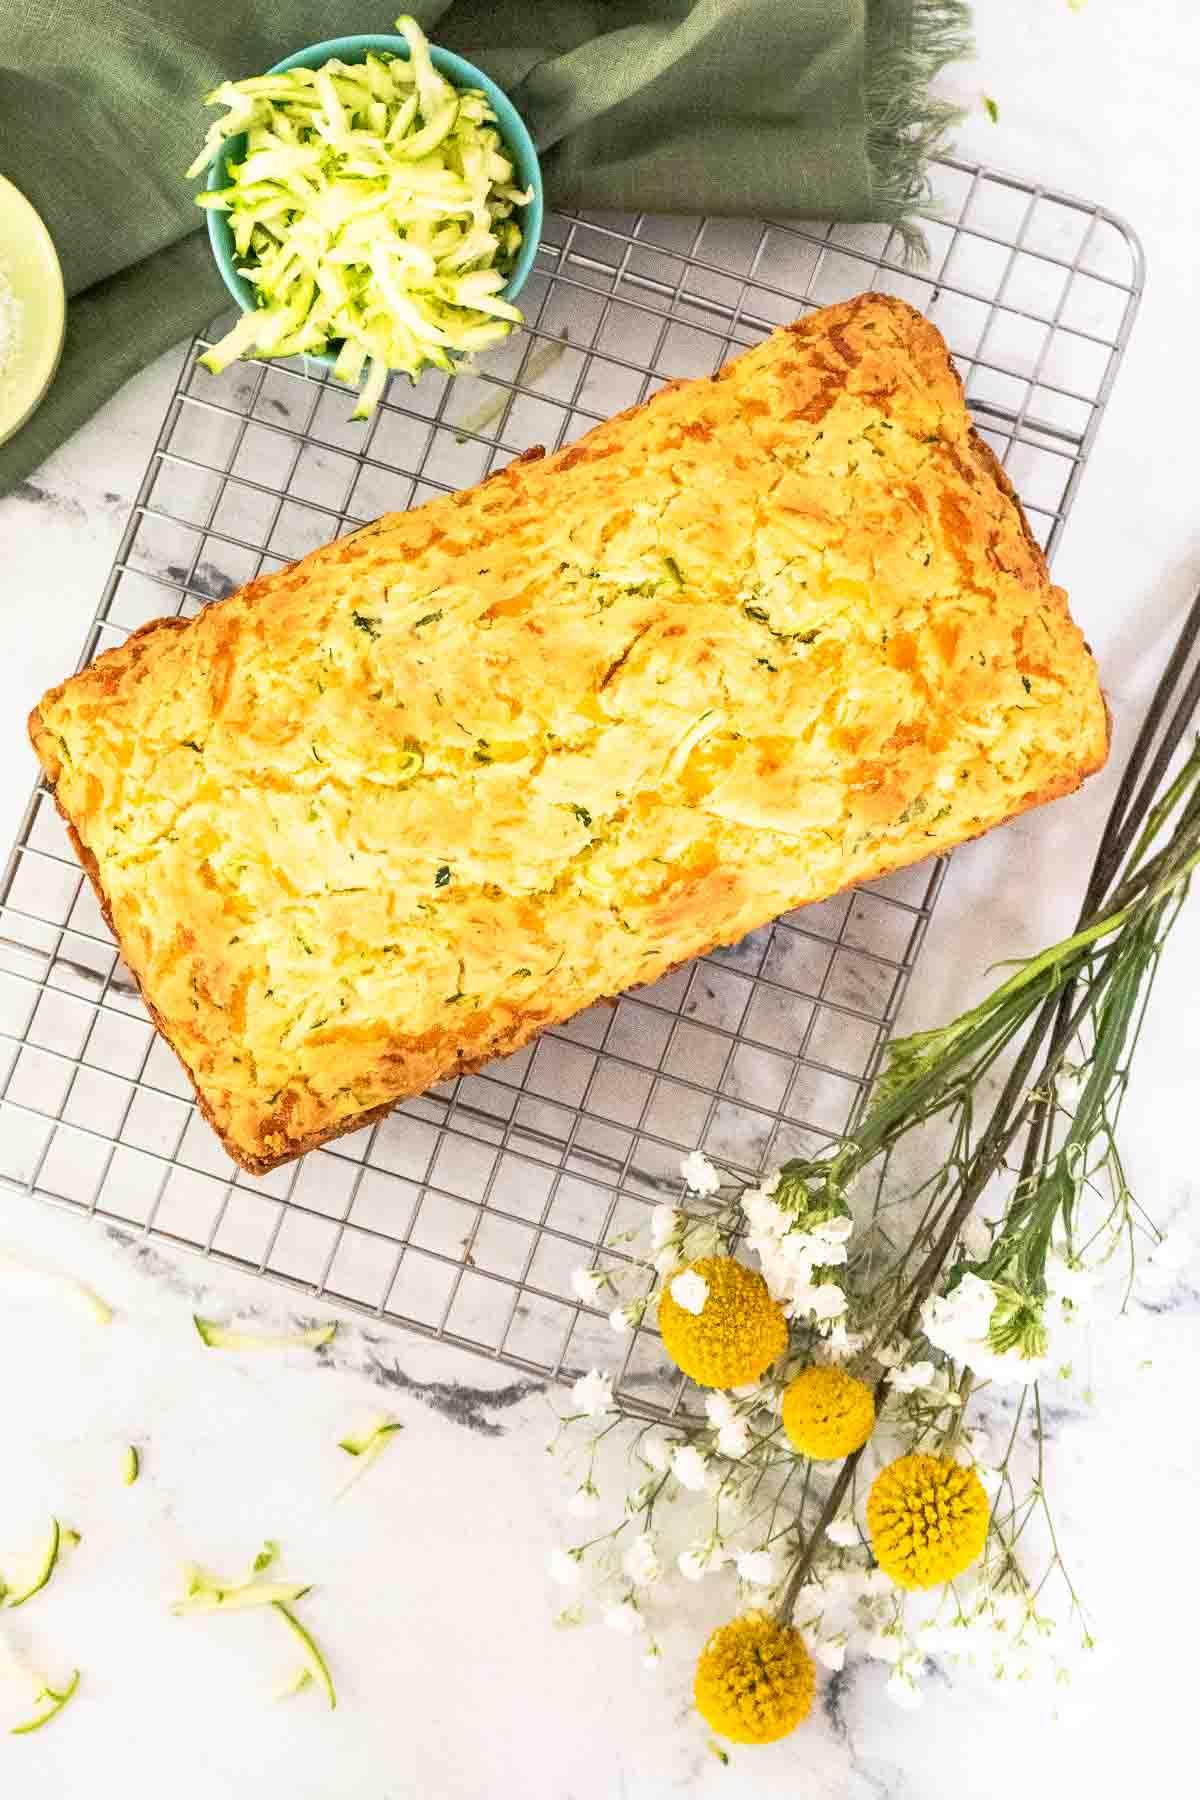 gluten free cheesy bread on wire rack